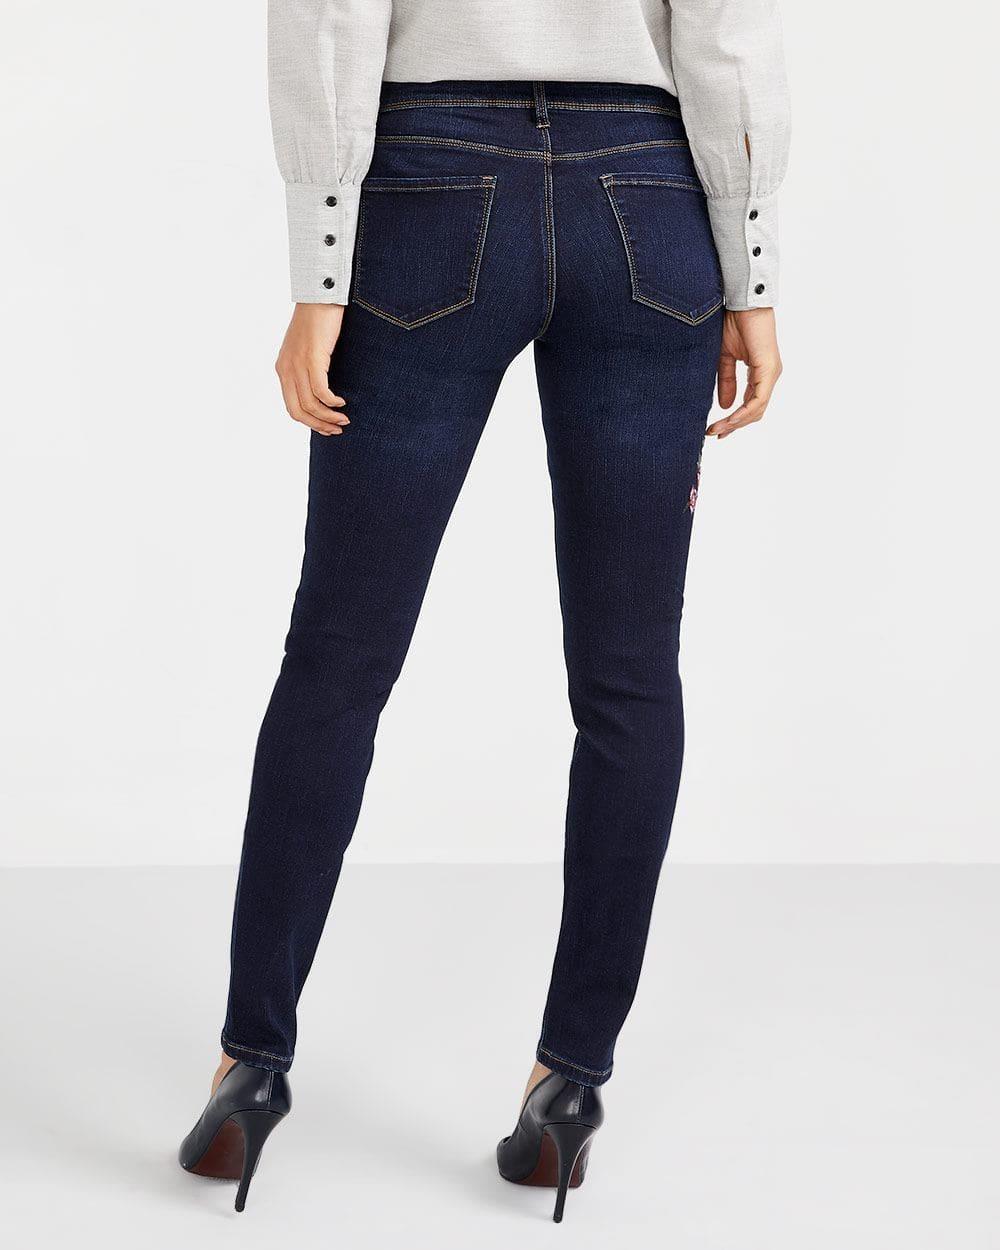 Embroidered Dark Wash Skinny Jeans